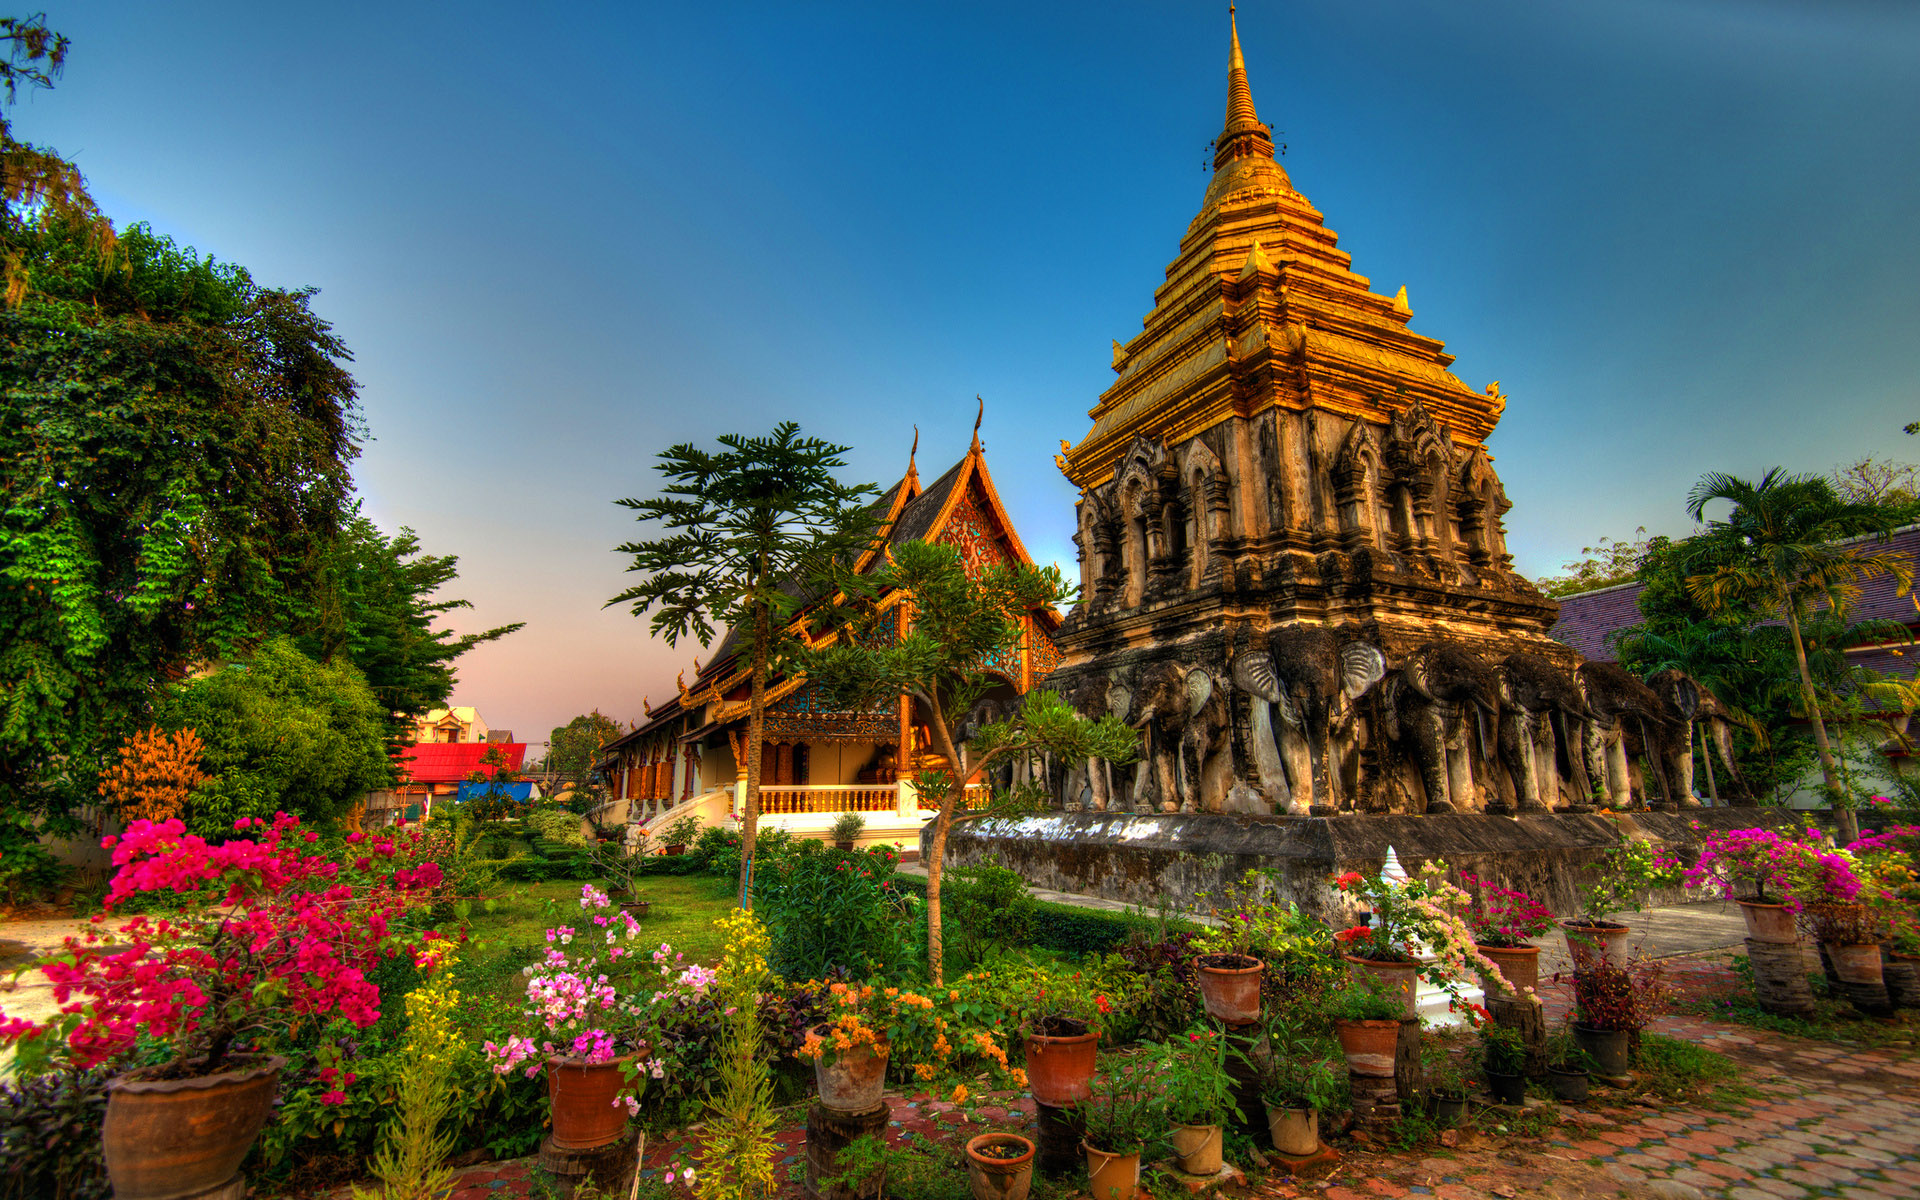 oboi_wat_chiang_man_chiang_mai_thailand_hram_vat_chiang_man_chiangmaj_tajland_tsveti_hrammoeec